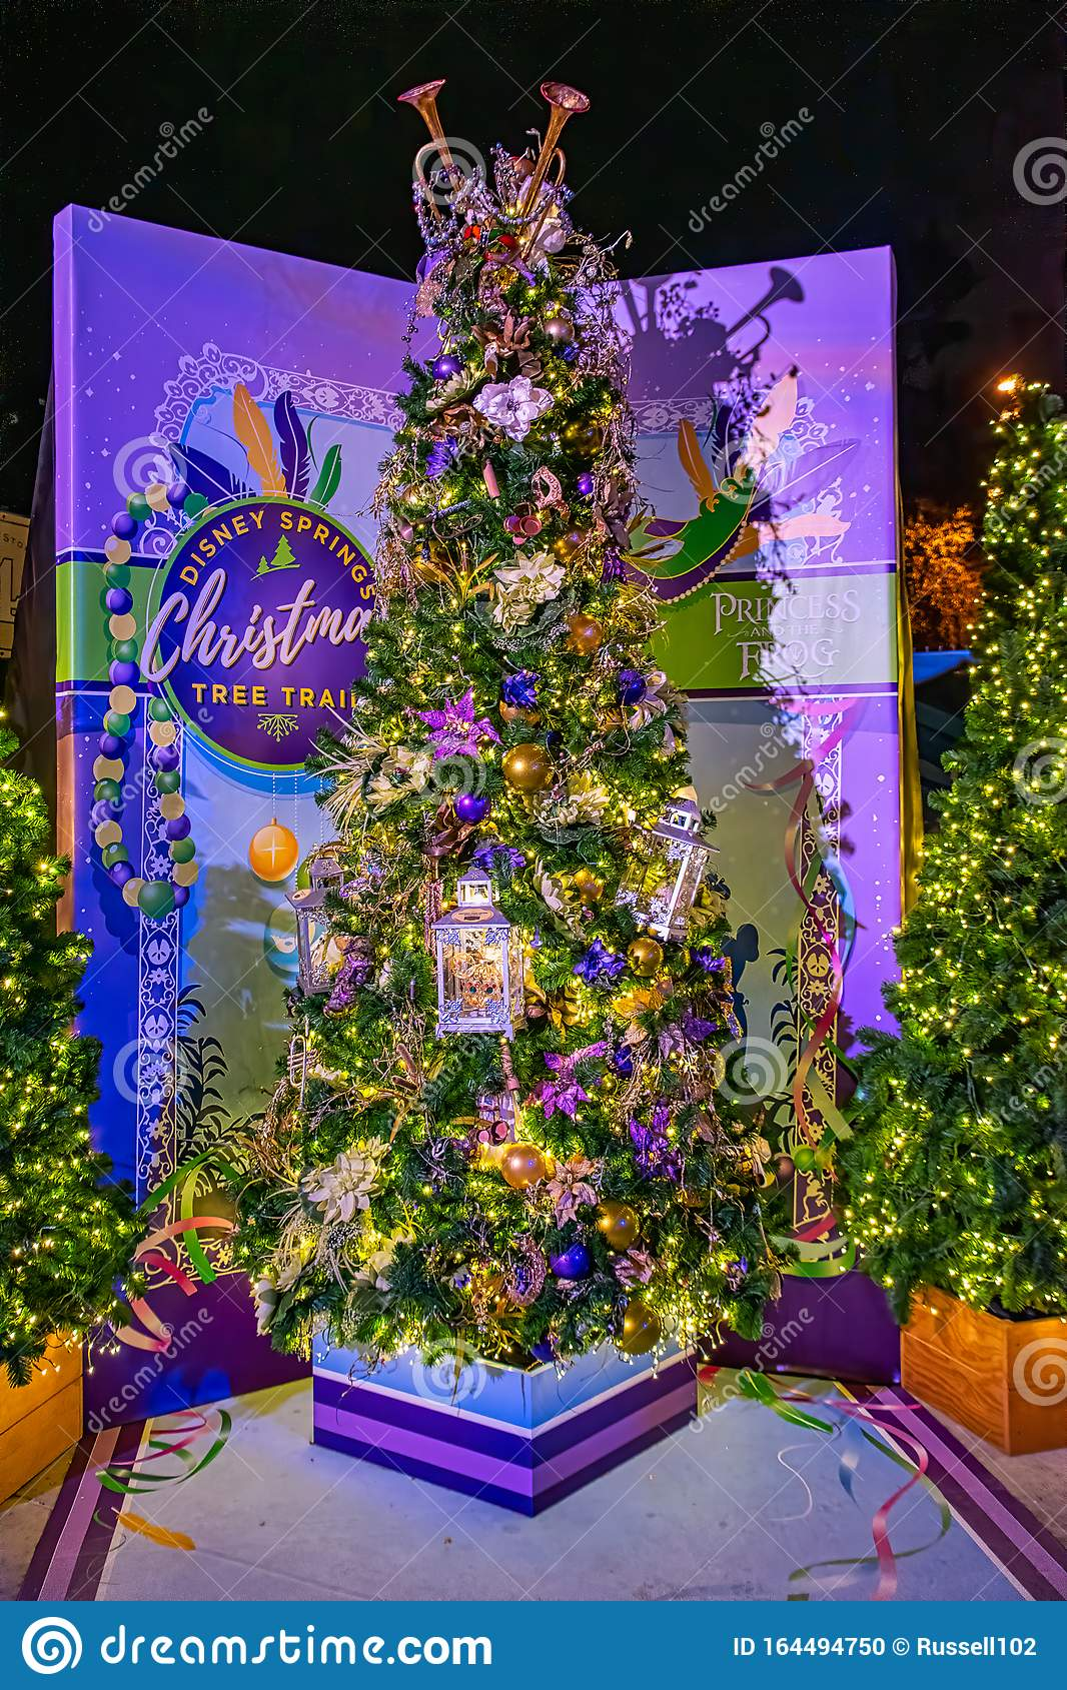 Princess And The Frog Themed Christmas Tree Editorial Image Image Of Star Tree 164494750